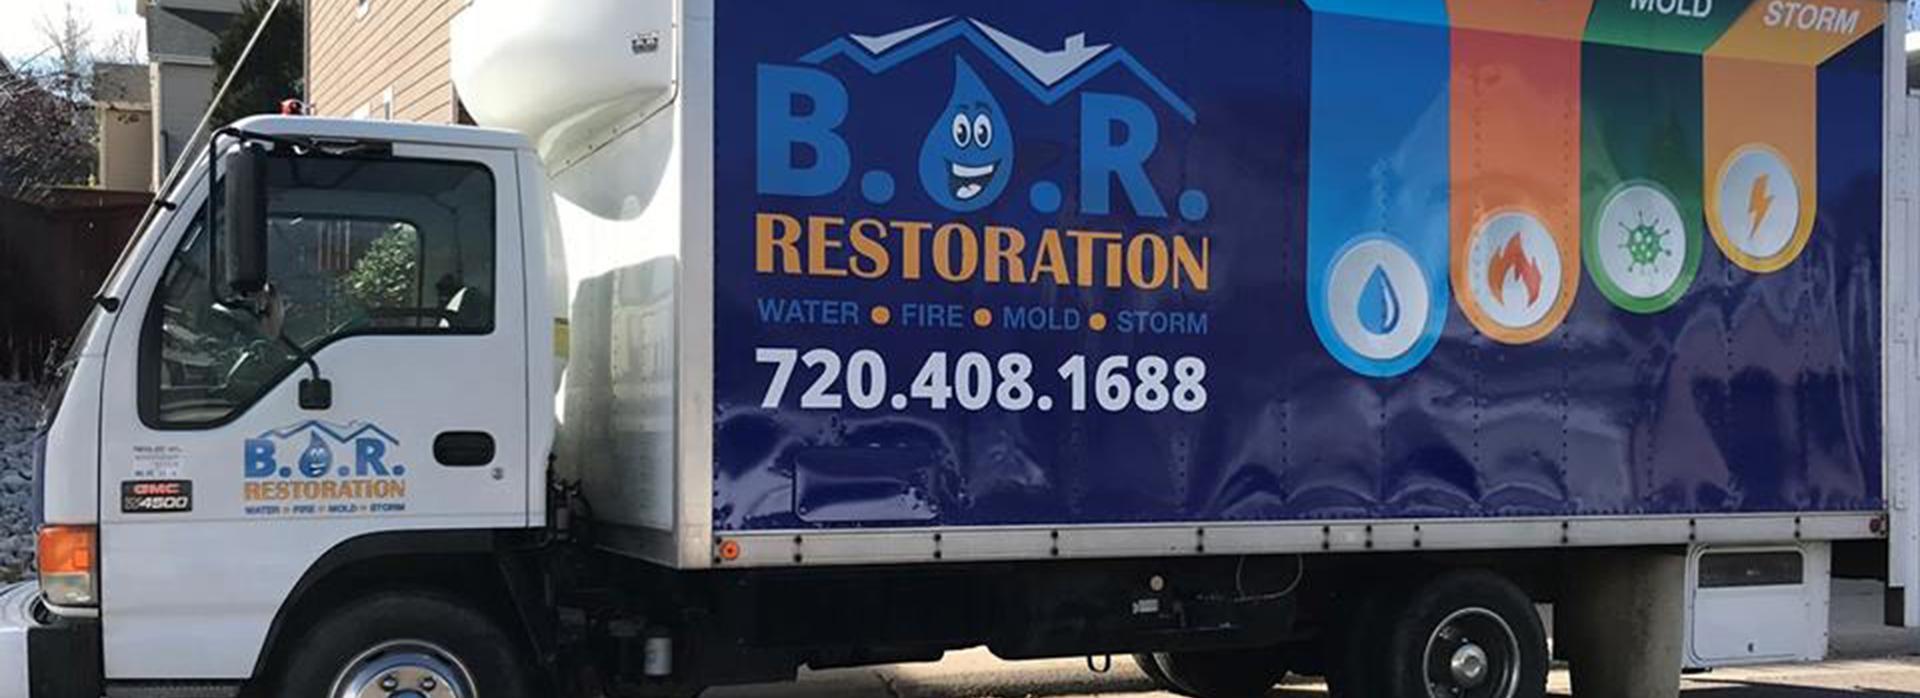 truck-bor-restoration-franchise-small